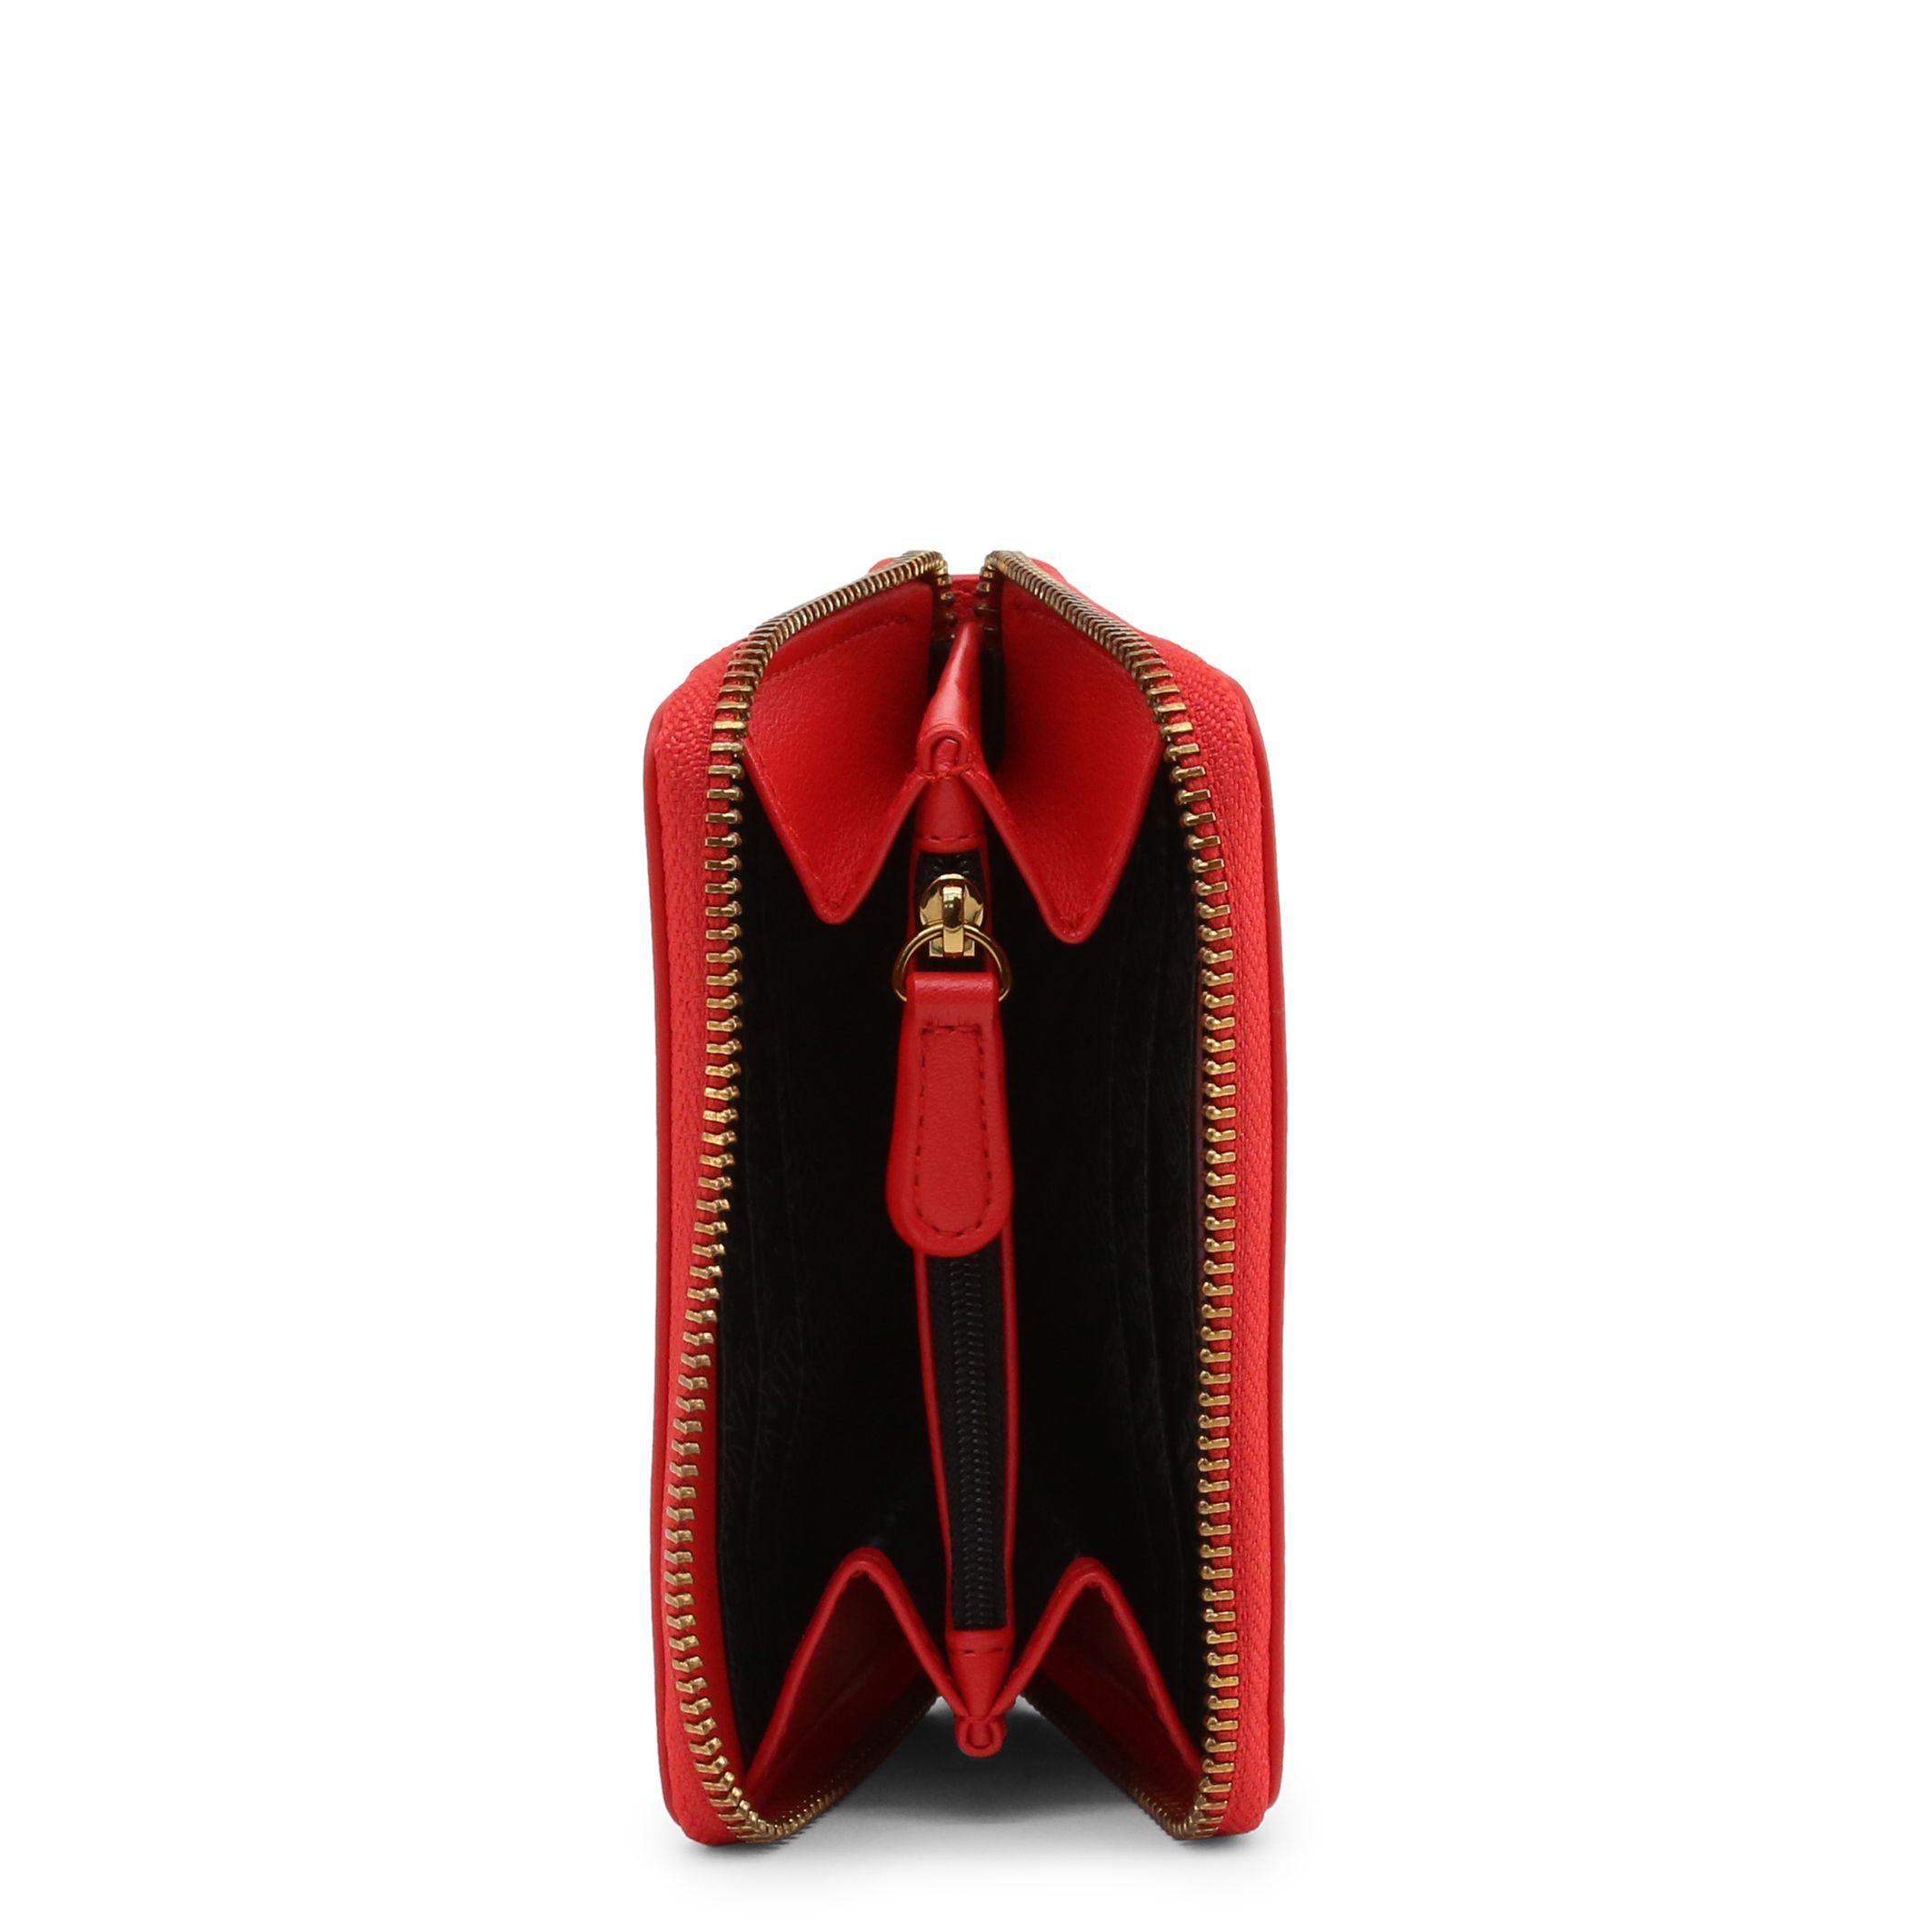 Love Moschino – JC5624PP1BLK – Rood Designeritems.nl